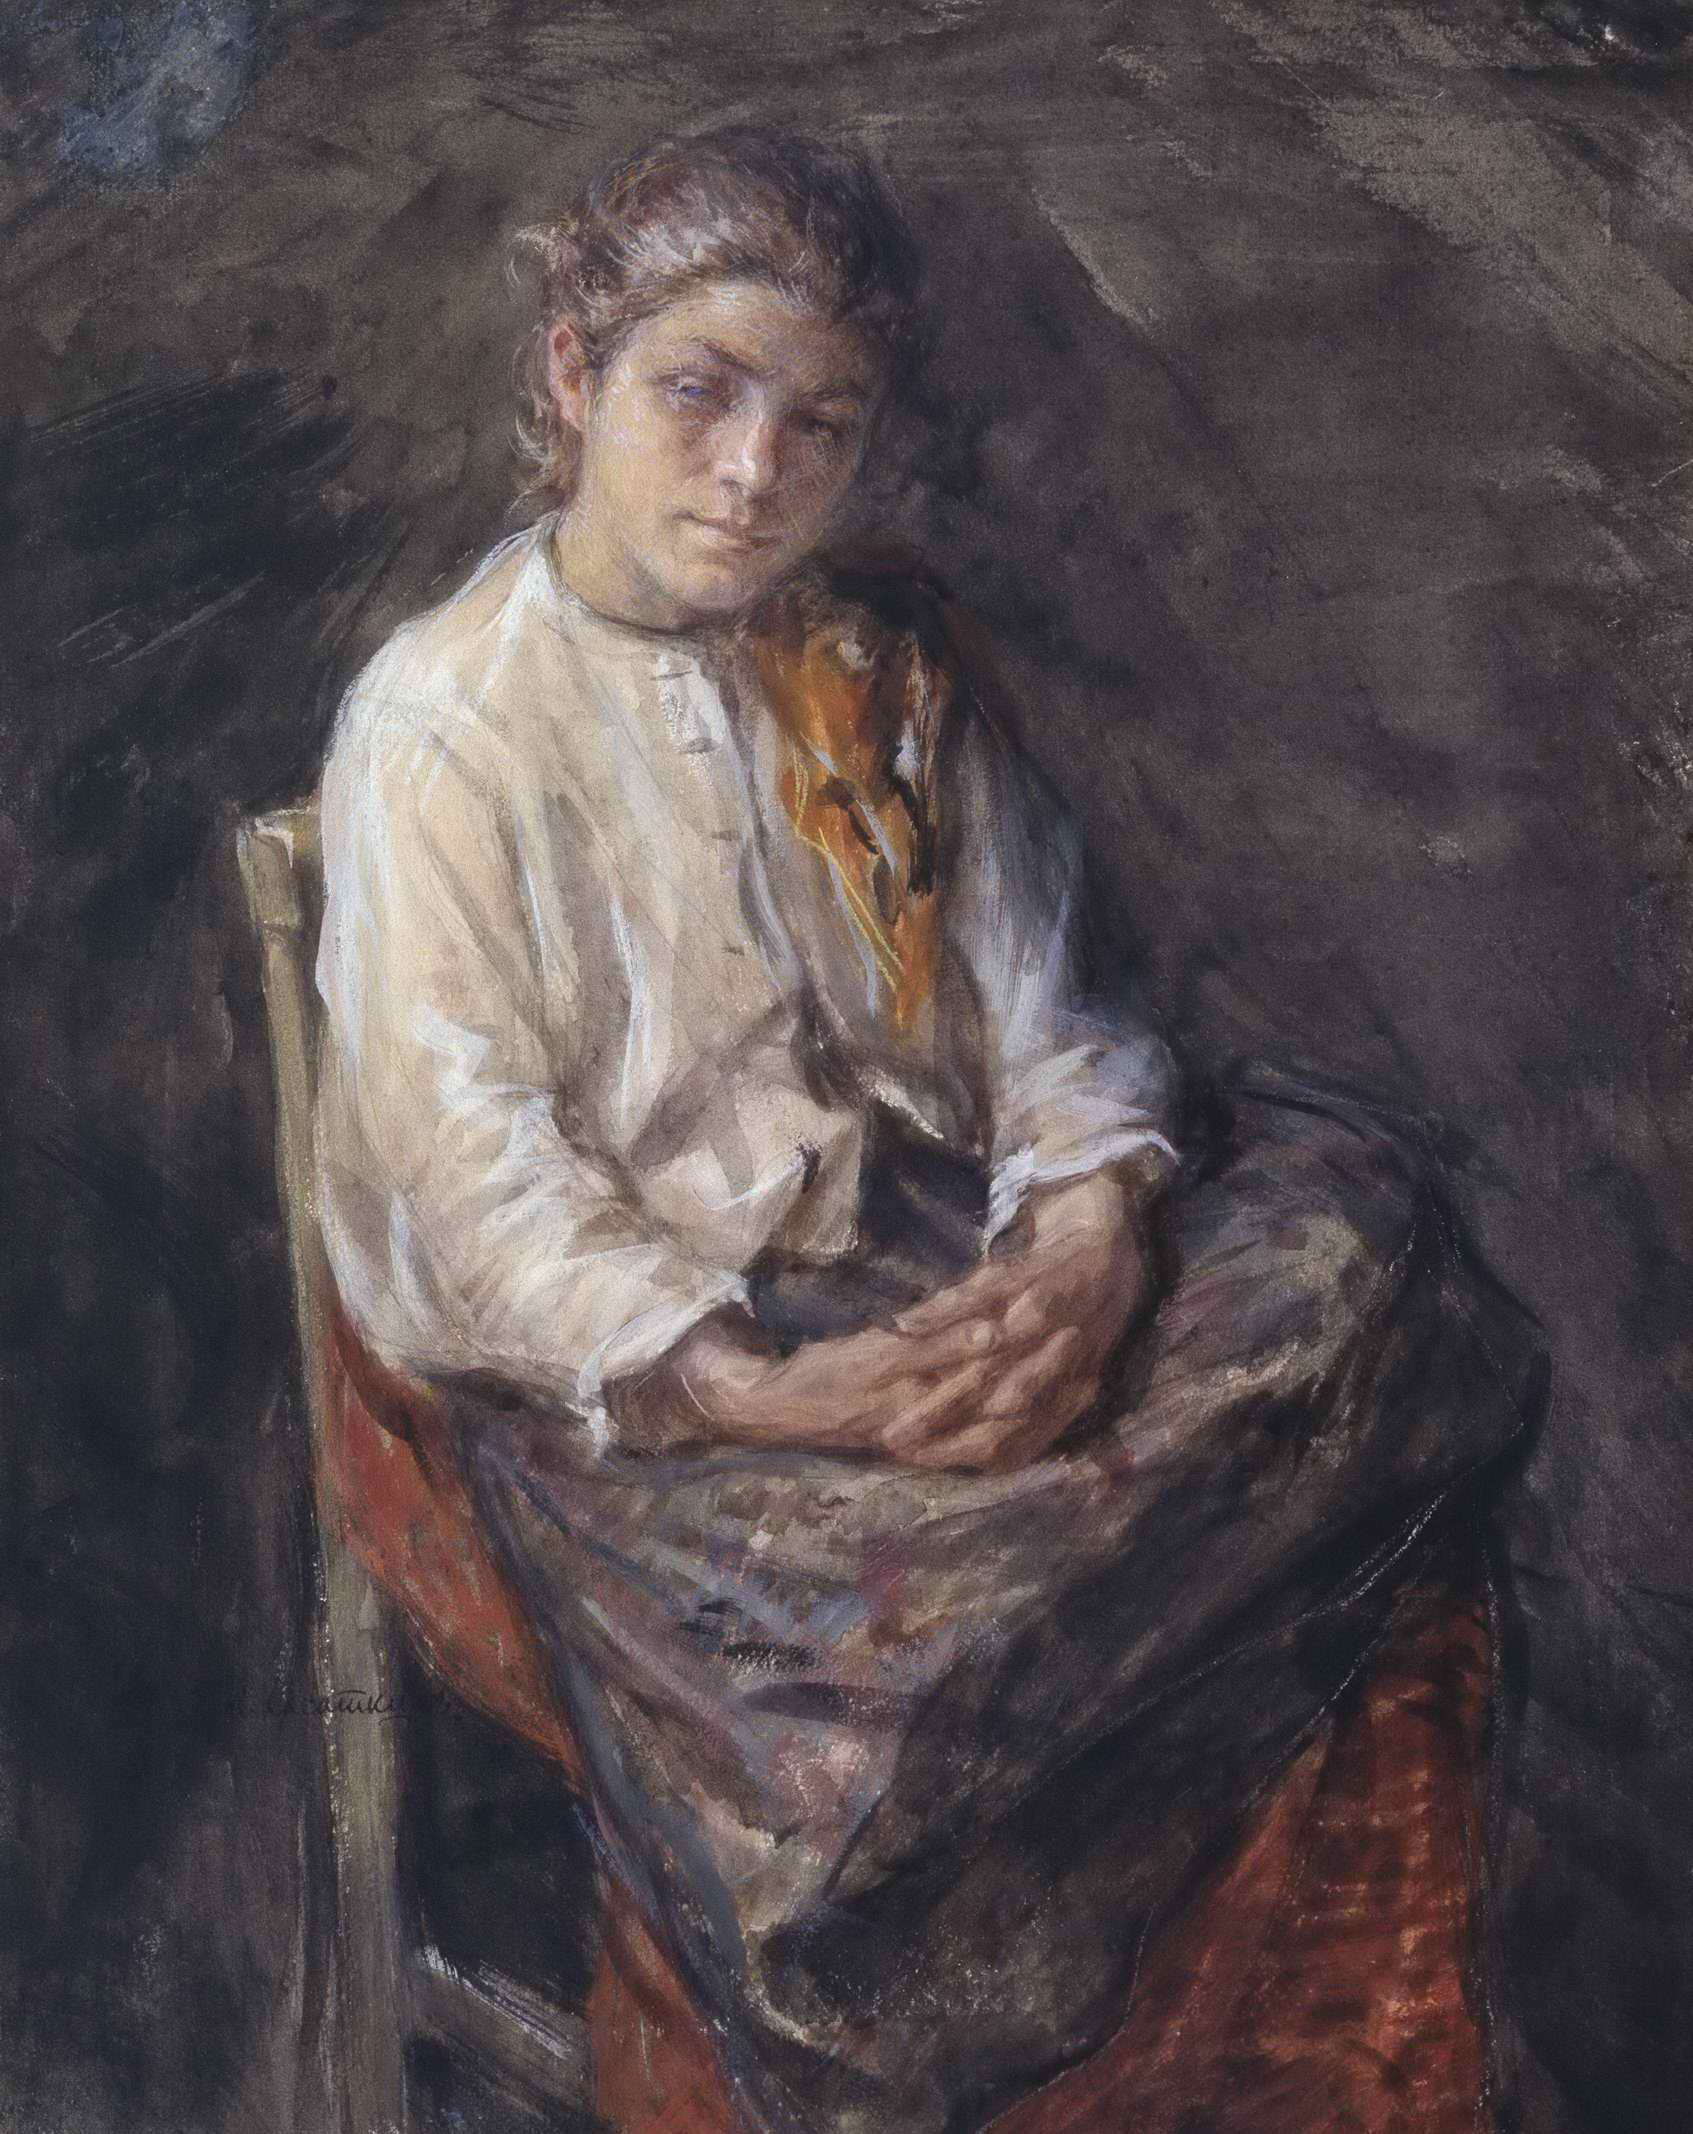 Касаткин Н.А. - Портрет девочки-шахтерки